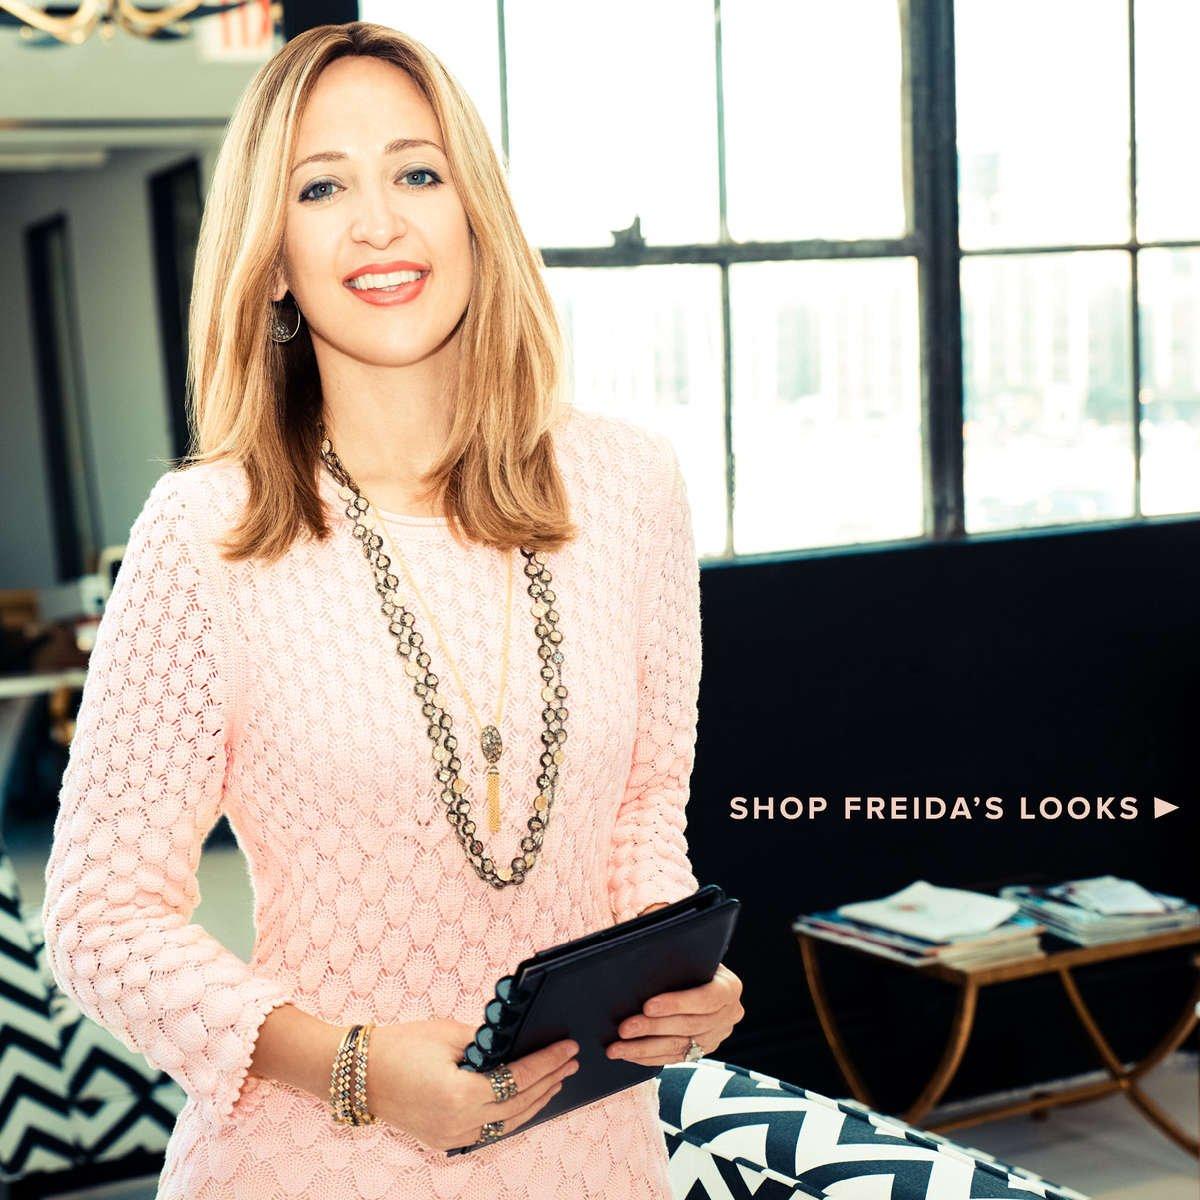 Shop Freida Rothman's PIcks